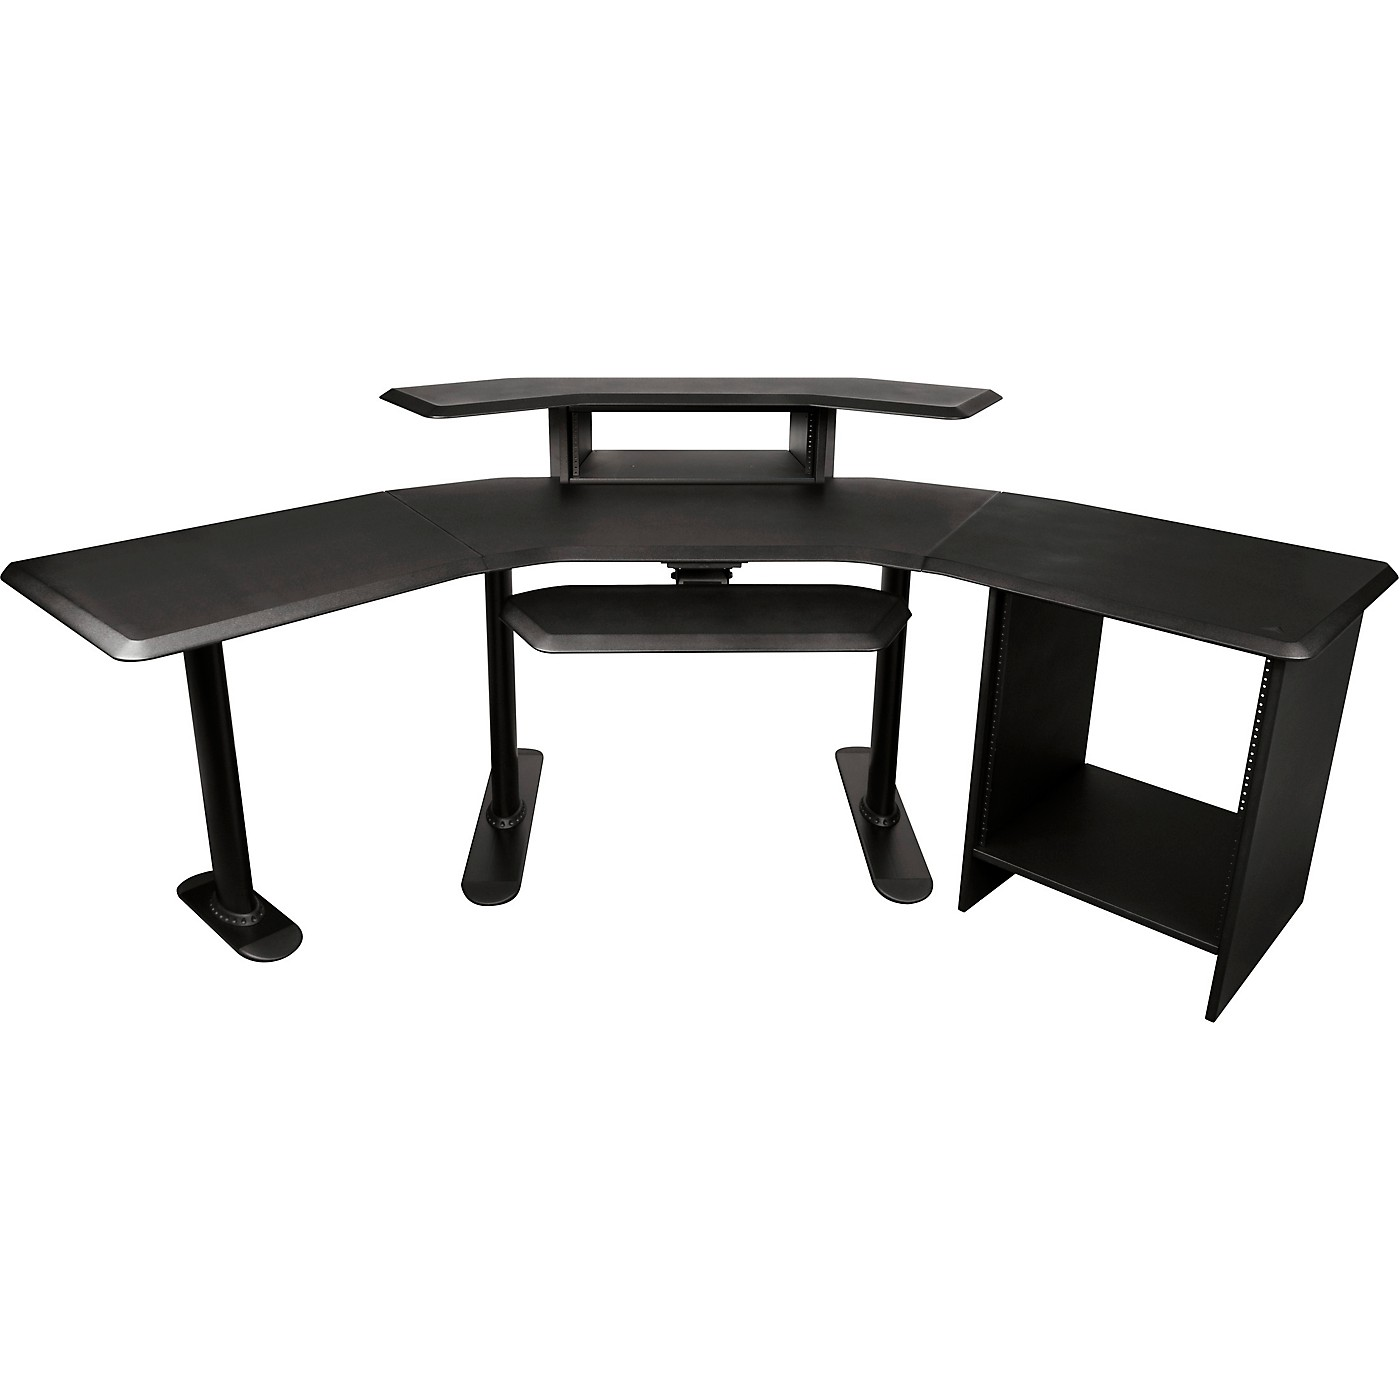 Ultimate Support NUC-004 Nucleus Series - Studio Desk - Base model, 24